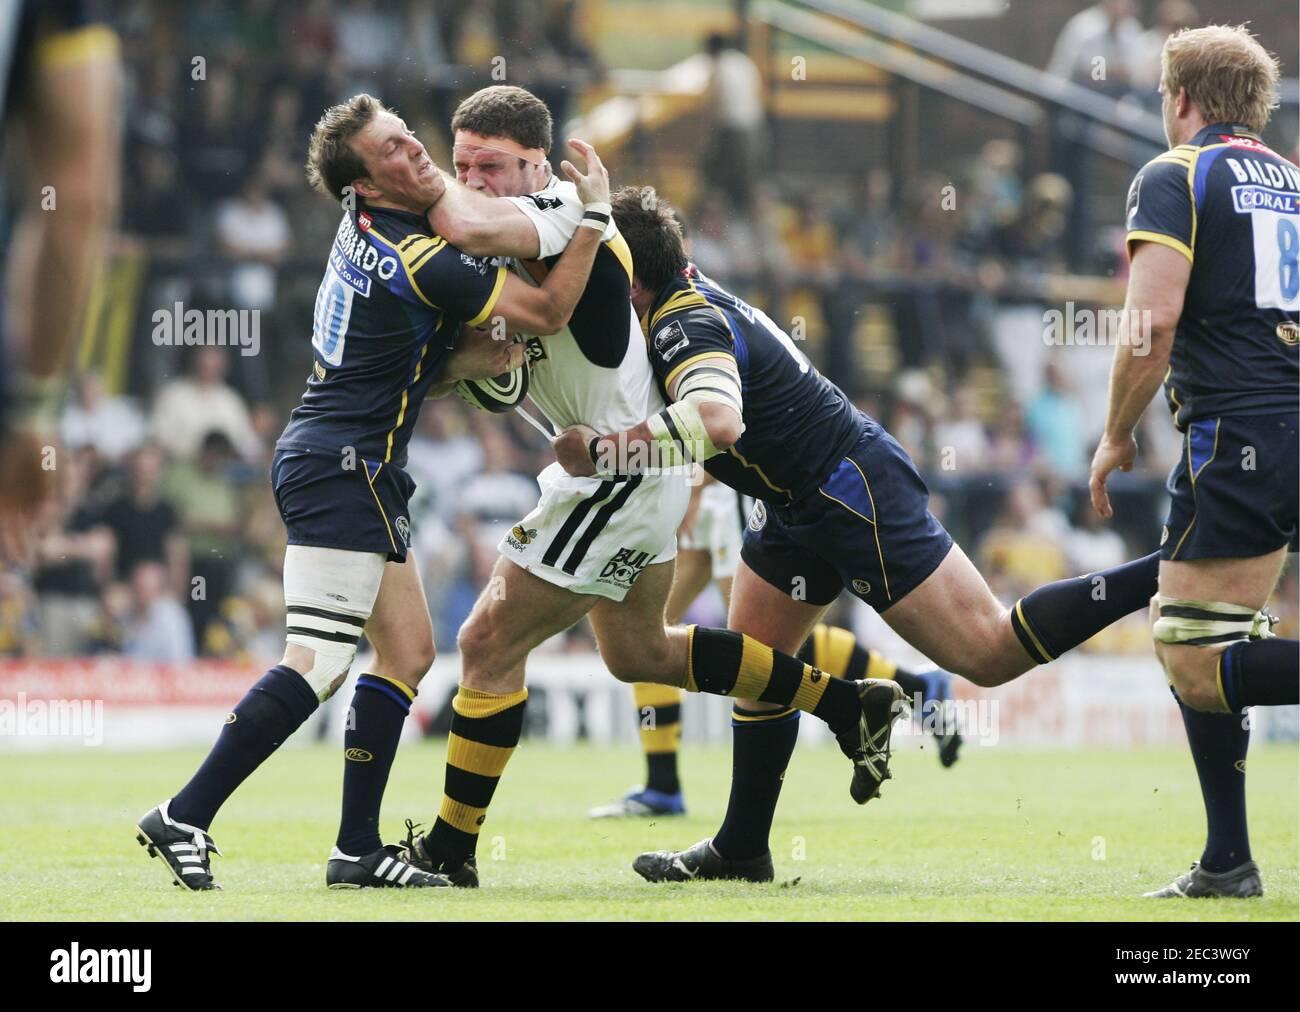 Rugby Union - Leeds Carnegie / London Wasps Guinness Premiership - Headingley Carnegie - 10/5/08 Joe Worsley - London Wasps in azione contro Alberto di Bernardo - Leeds Carnegie (L) Mandatory Credit: Action Images / Lee Smith Foto Stock